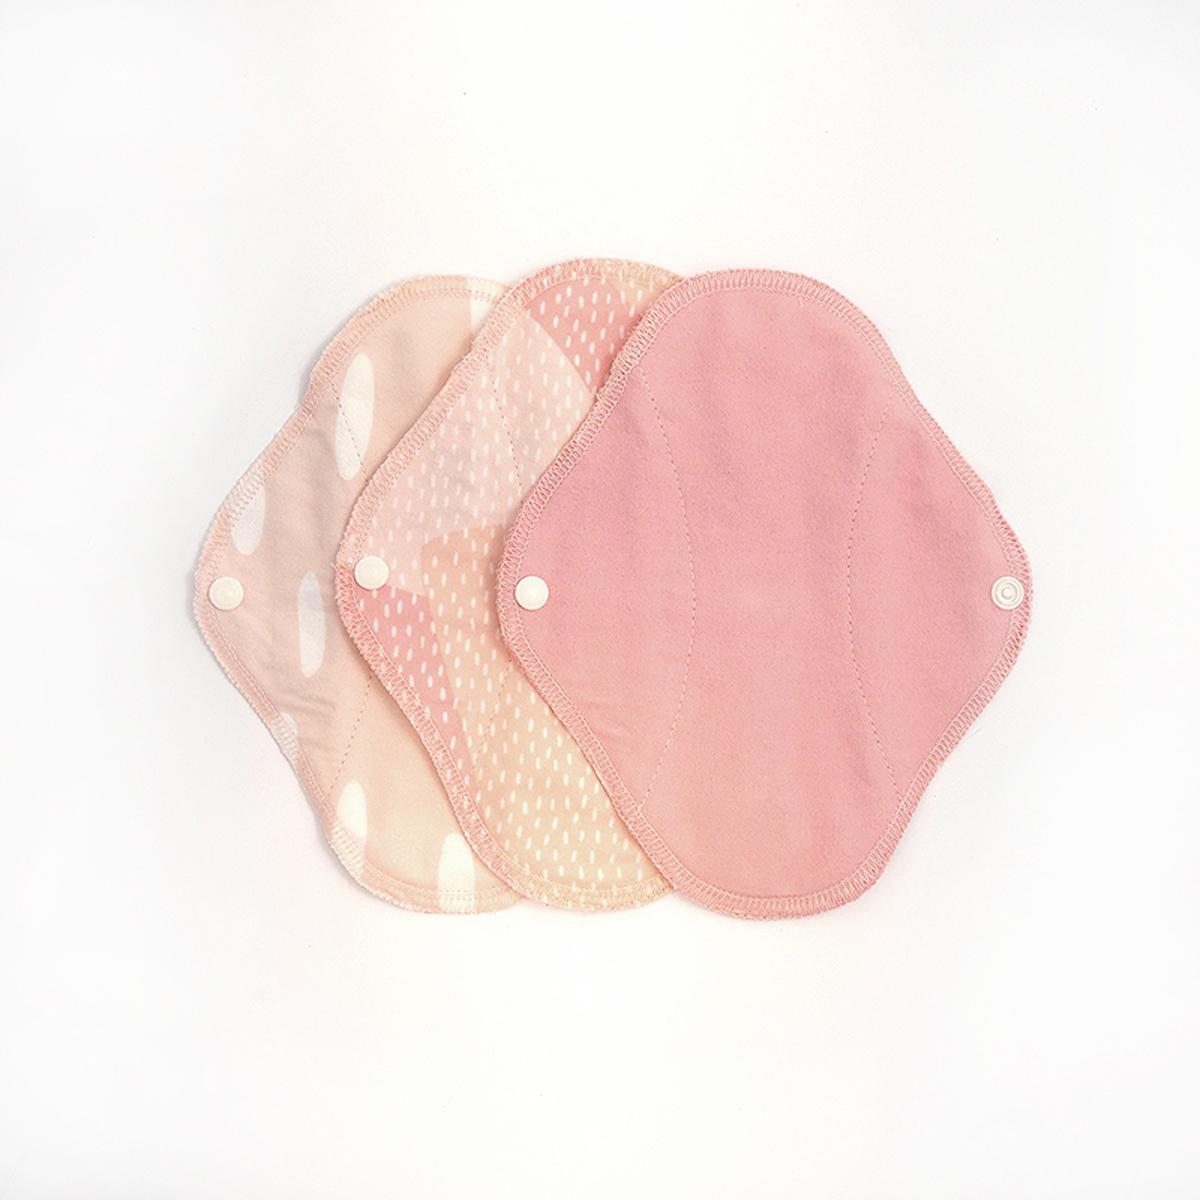 Imse Vimse trosskydd Classic Large natt 100% ekologisk bomull mönster Pink Sprinkle 3-pack